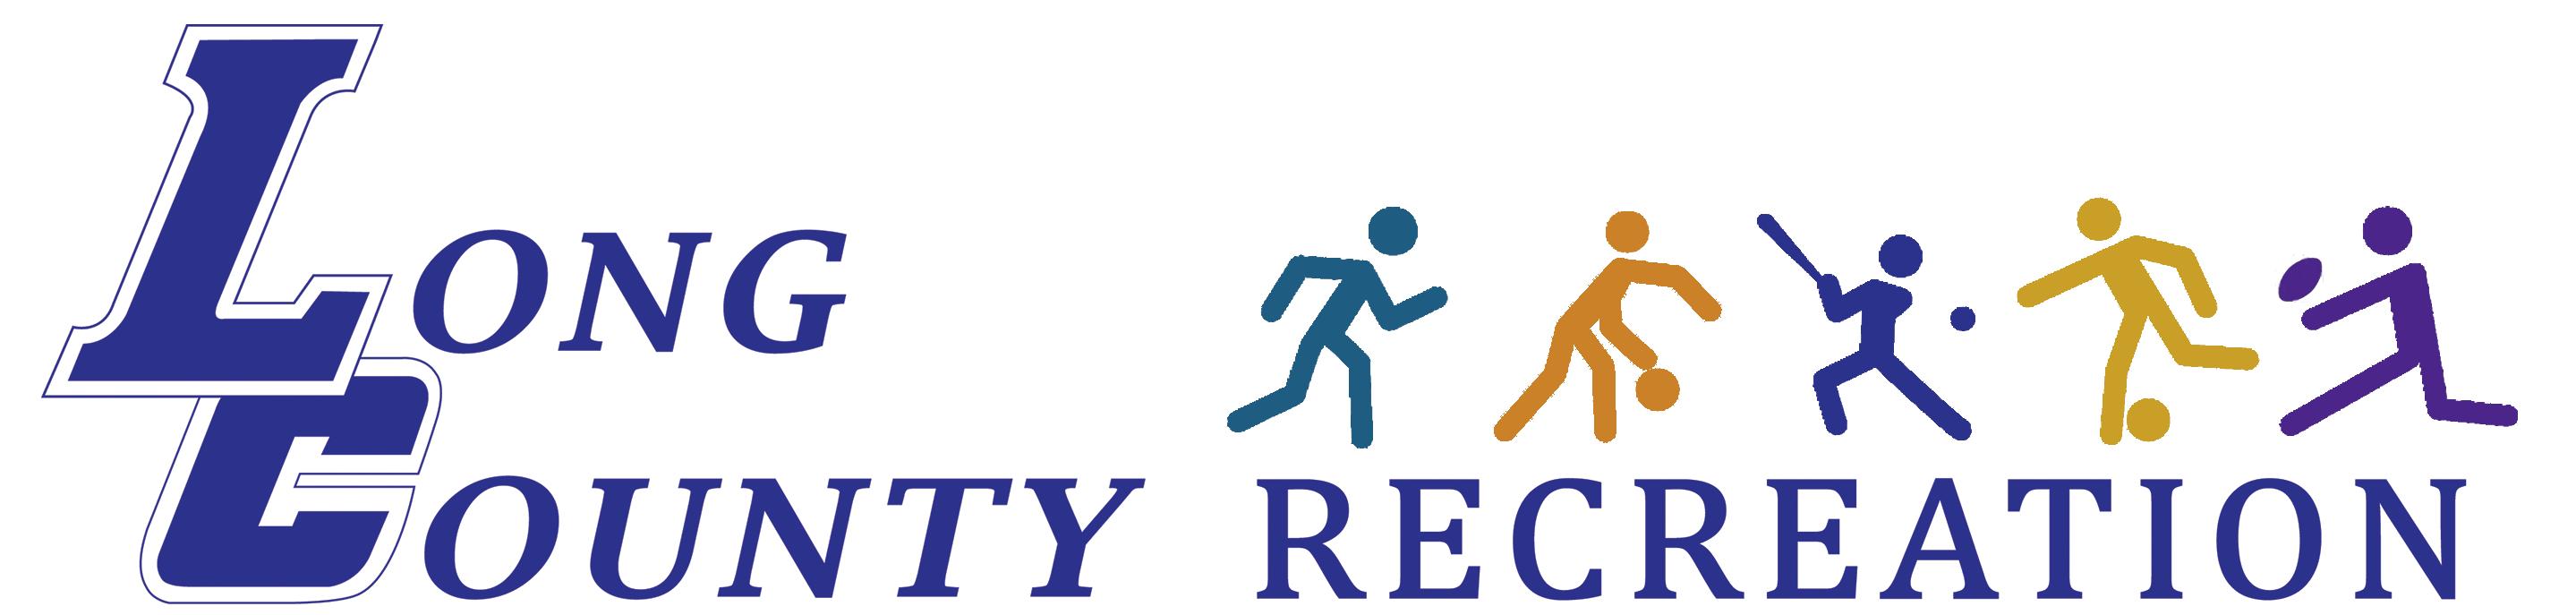 Long County Recreation Logo